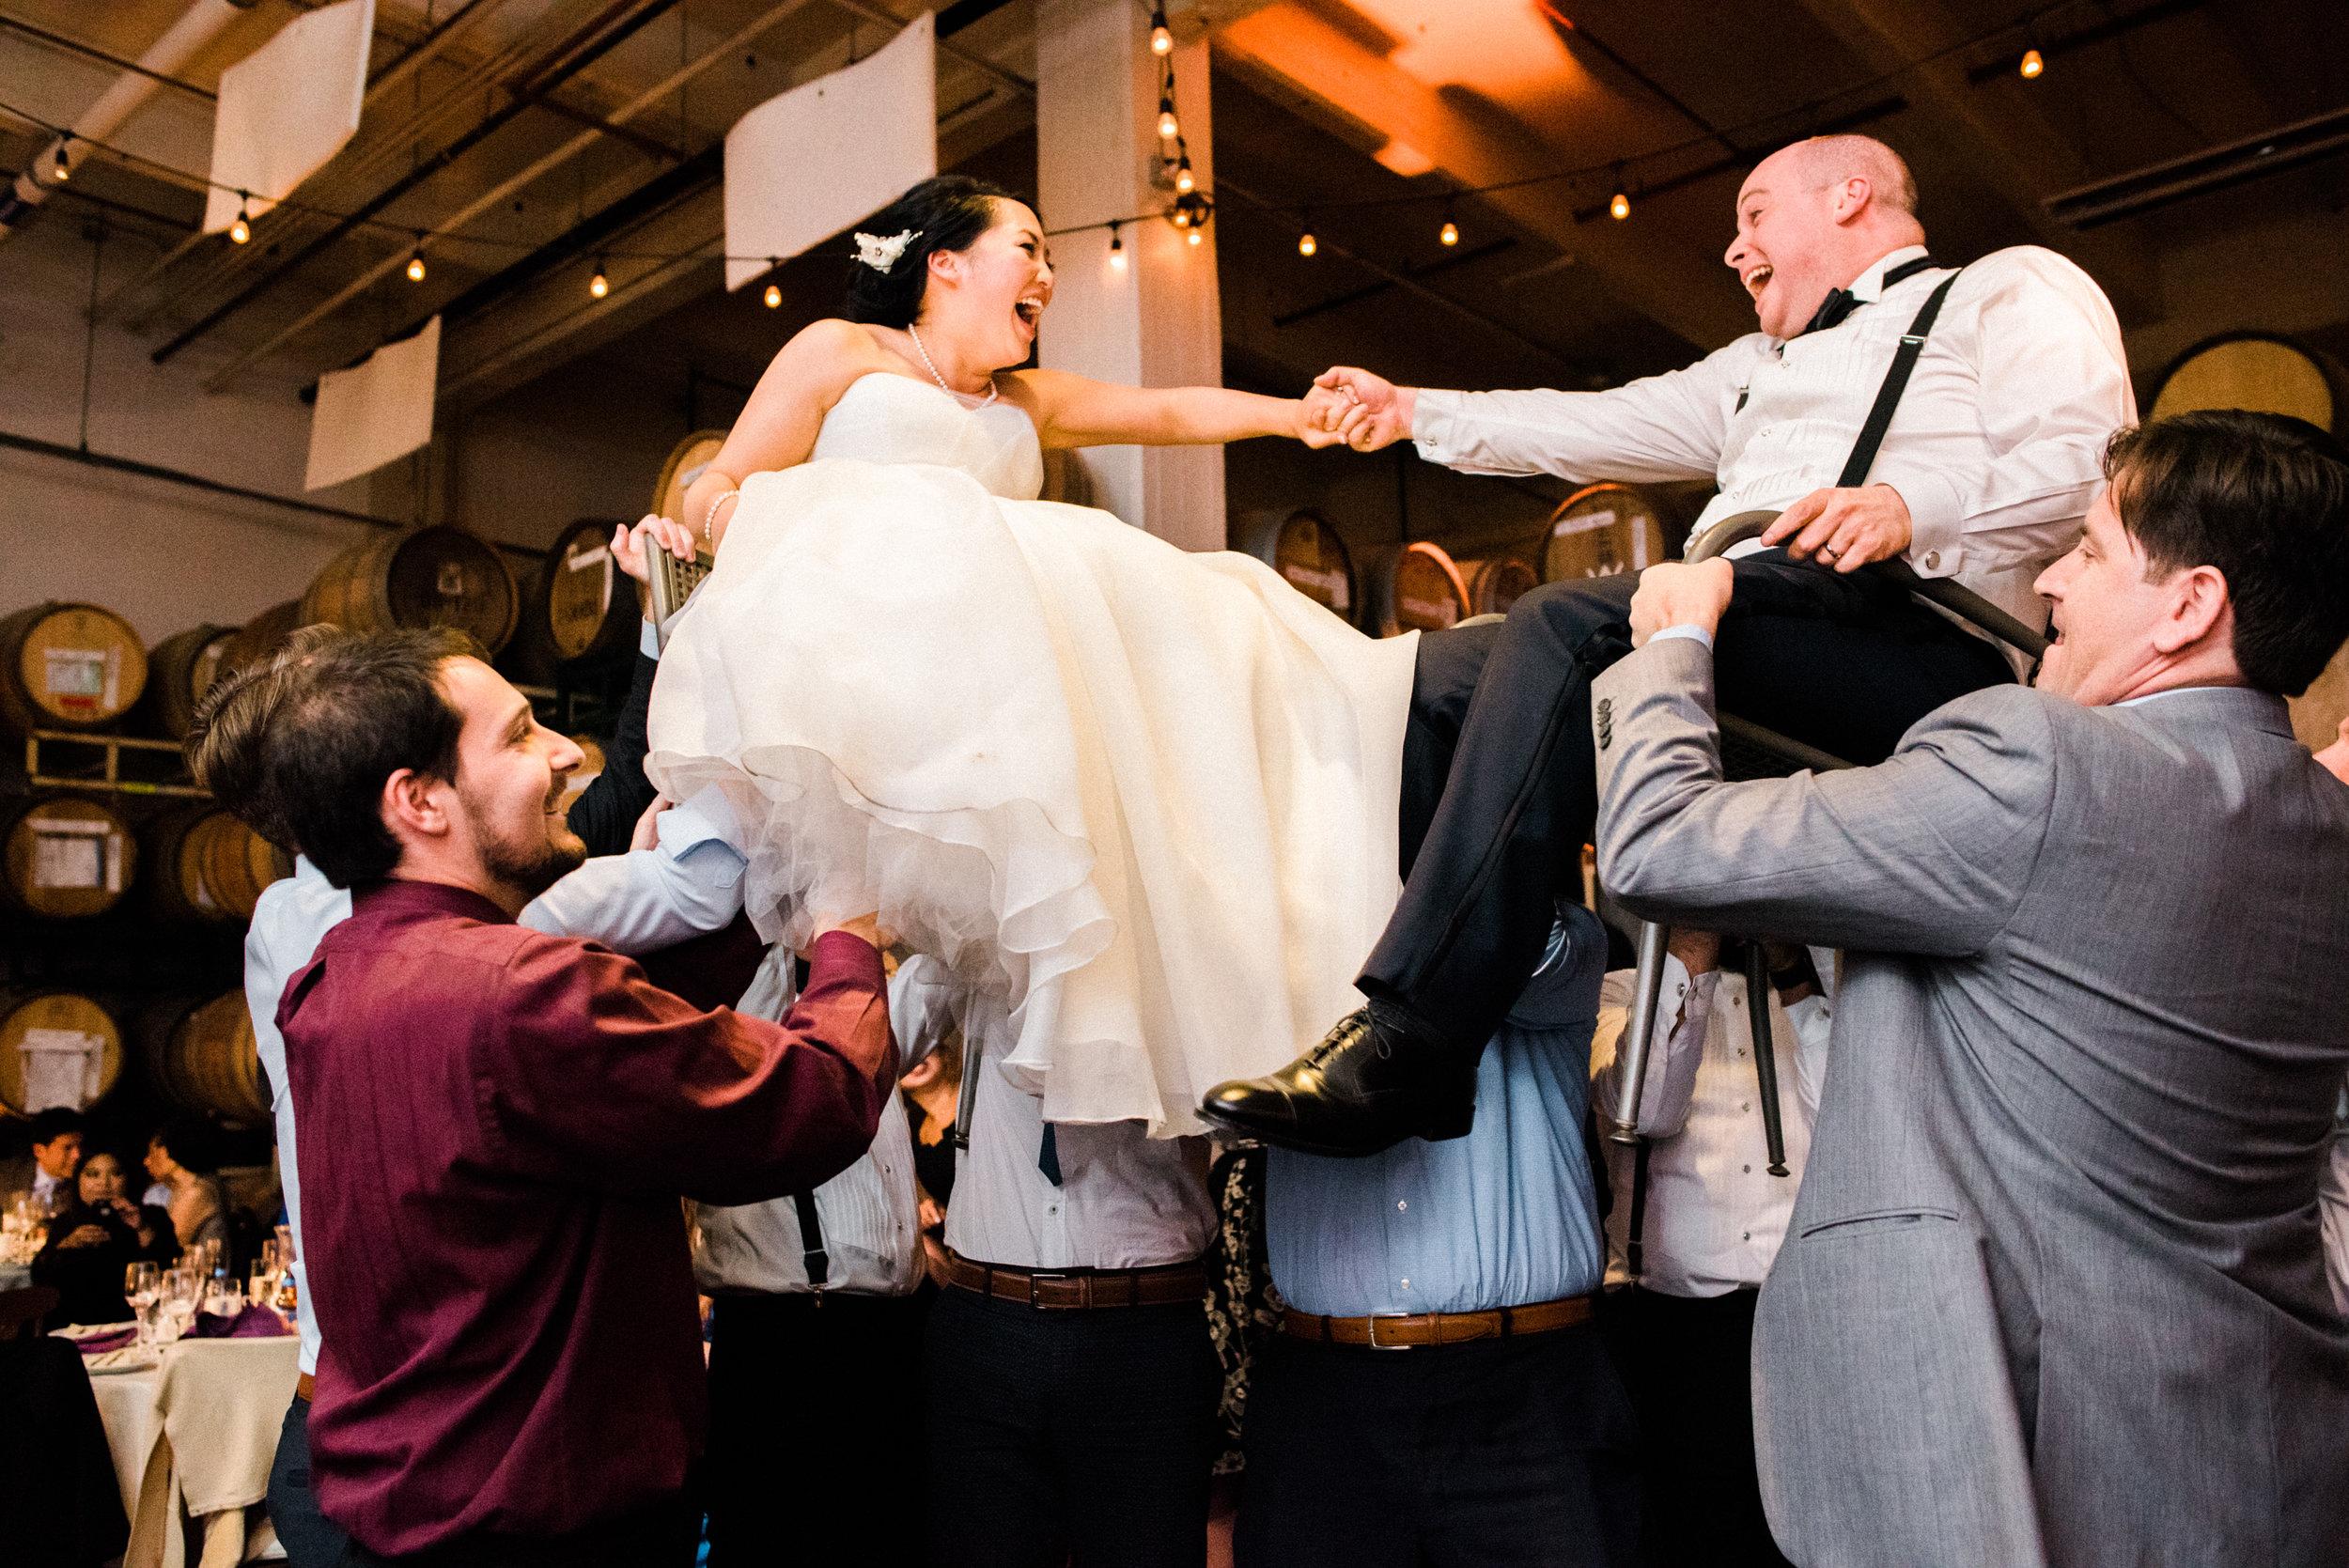 Swedenborgian Church Dogpatch Winery Wedding099.jpg